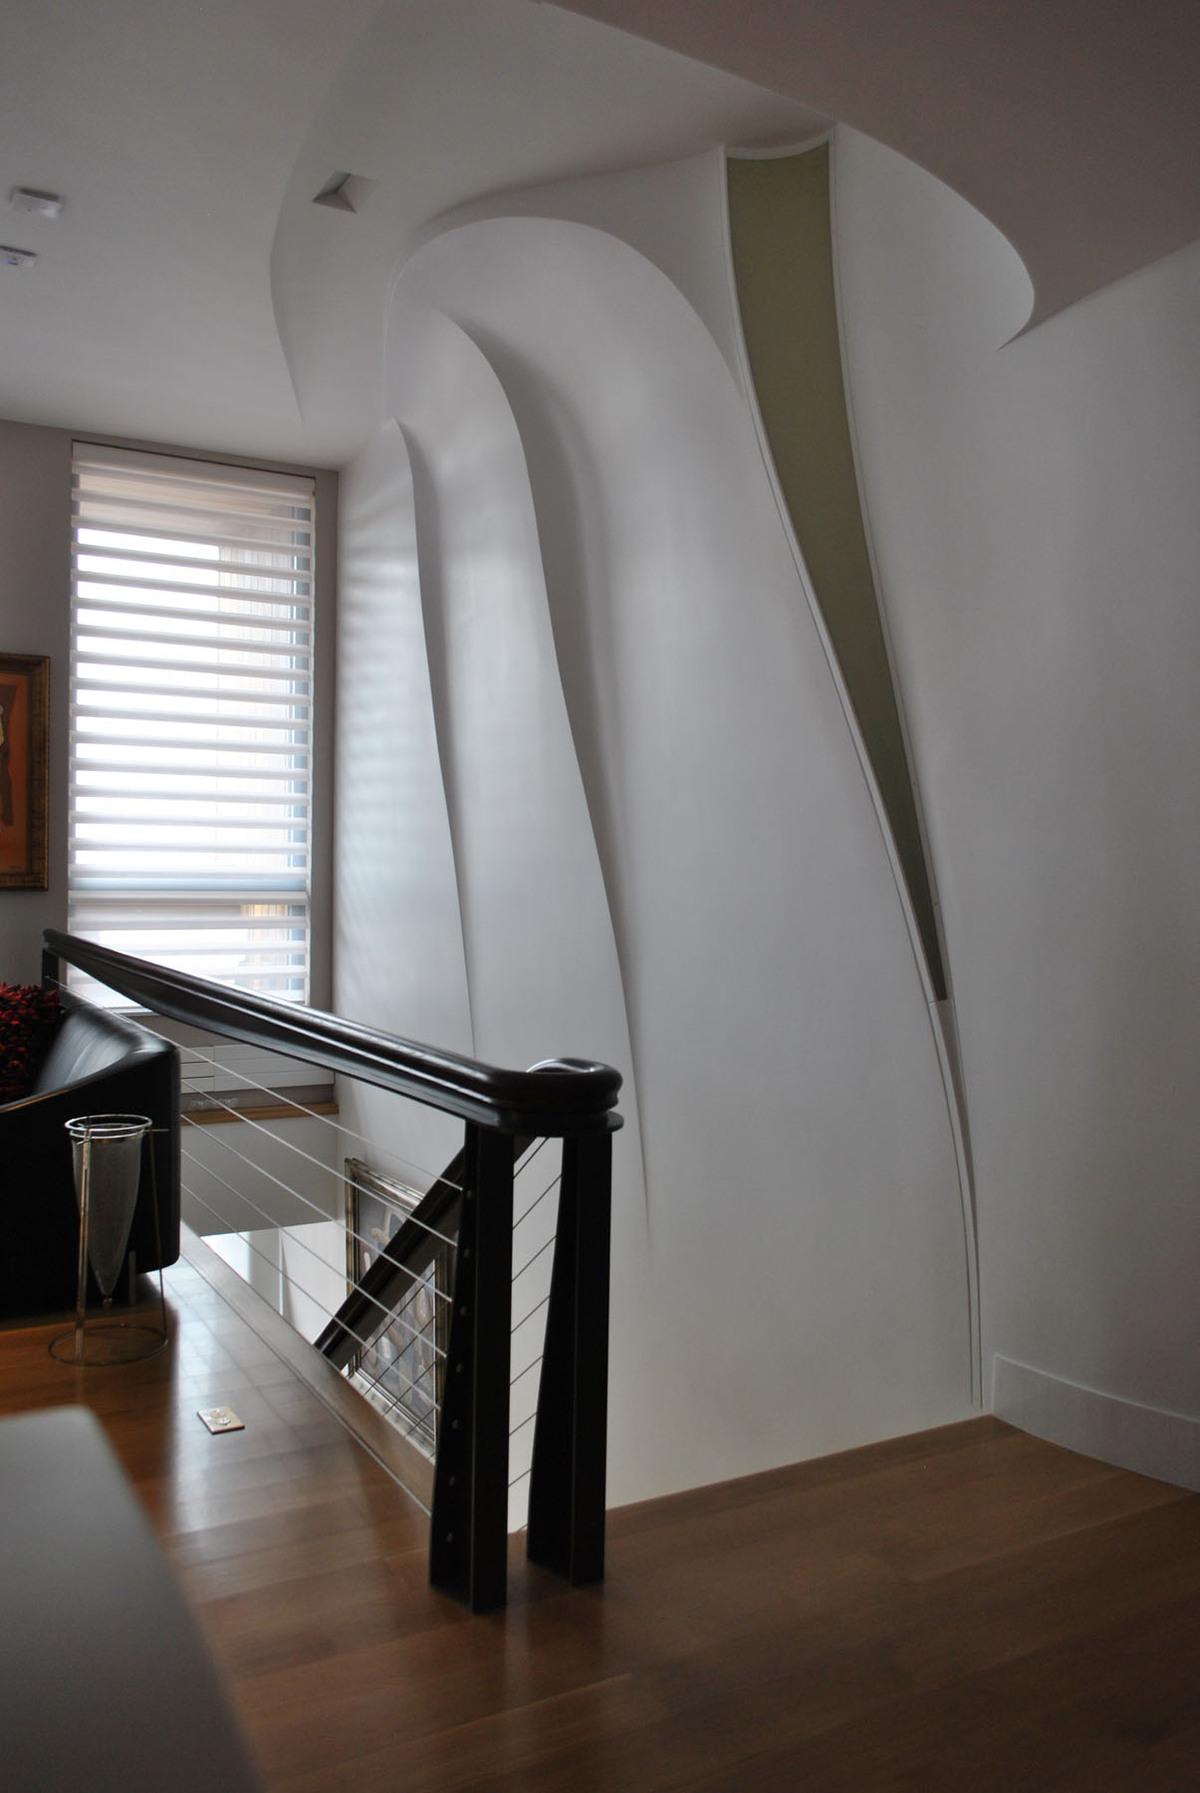 ancu Residence - Signature Stair (Image: Nastasi Architects)